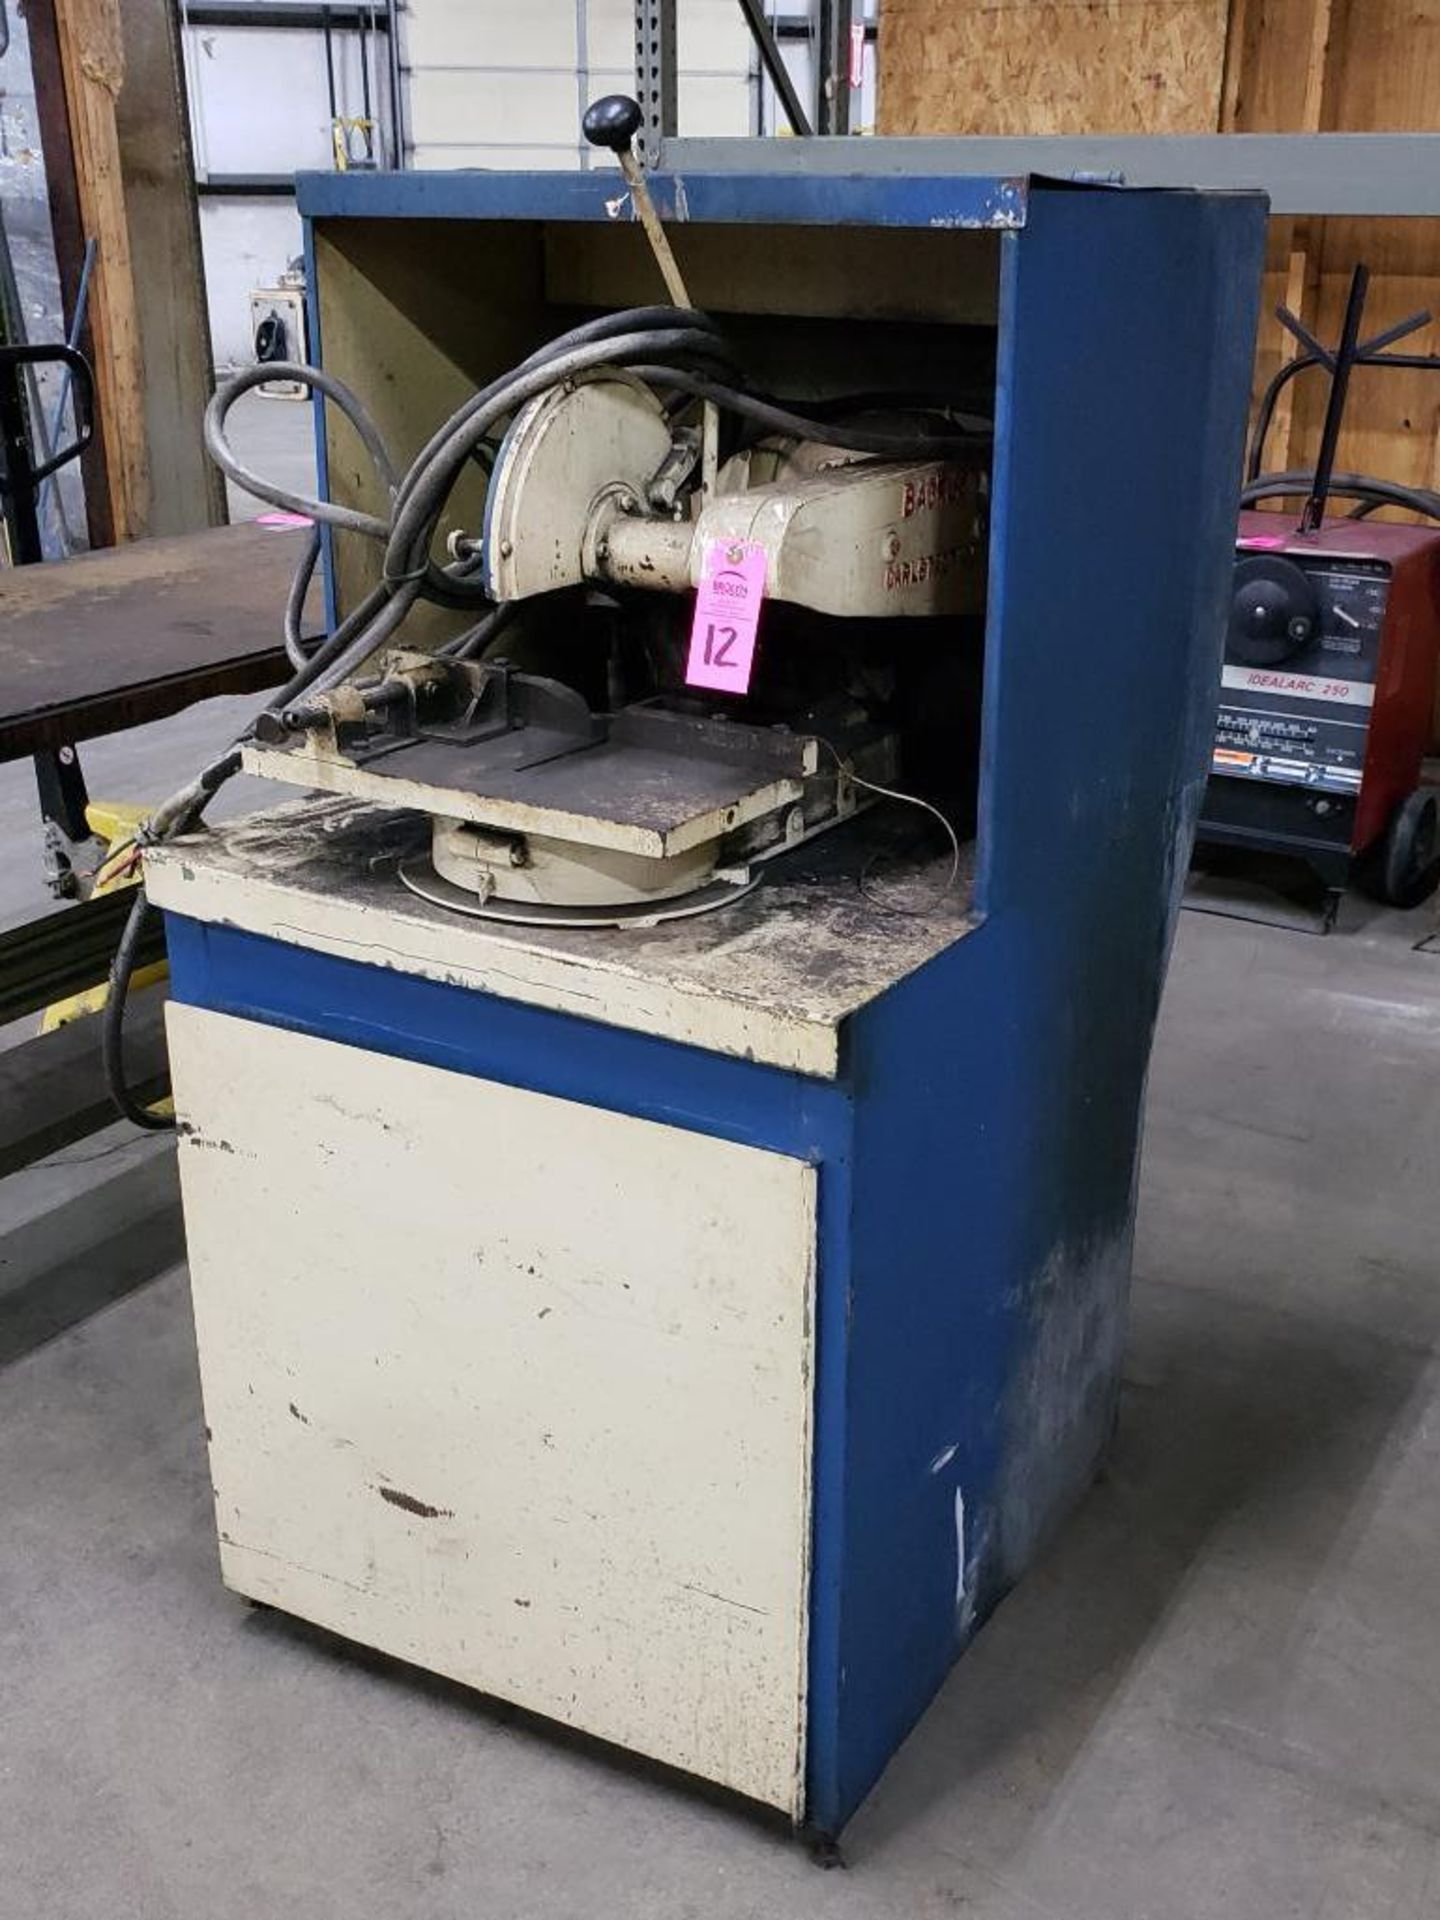 Lot 12 - Backus 2hp cold abrasive saw. 3 phase, 208-230/460v.